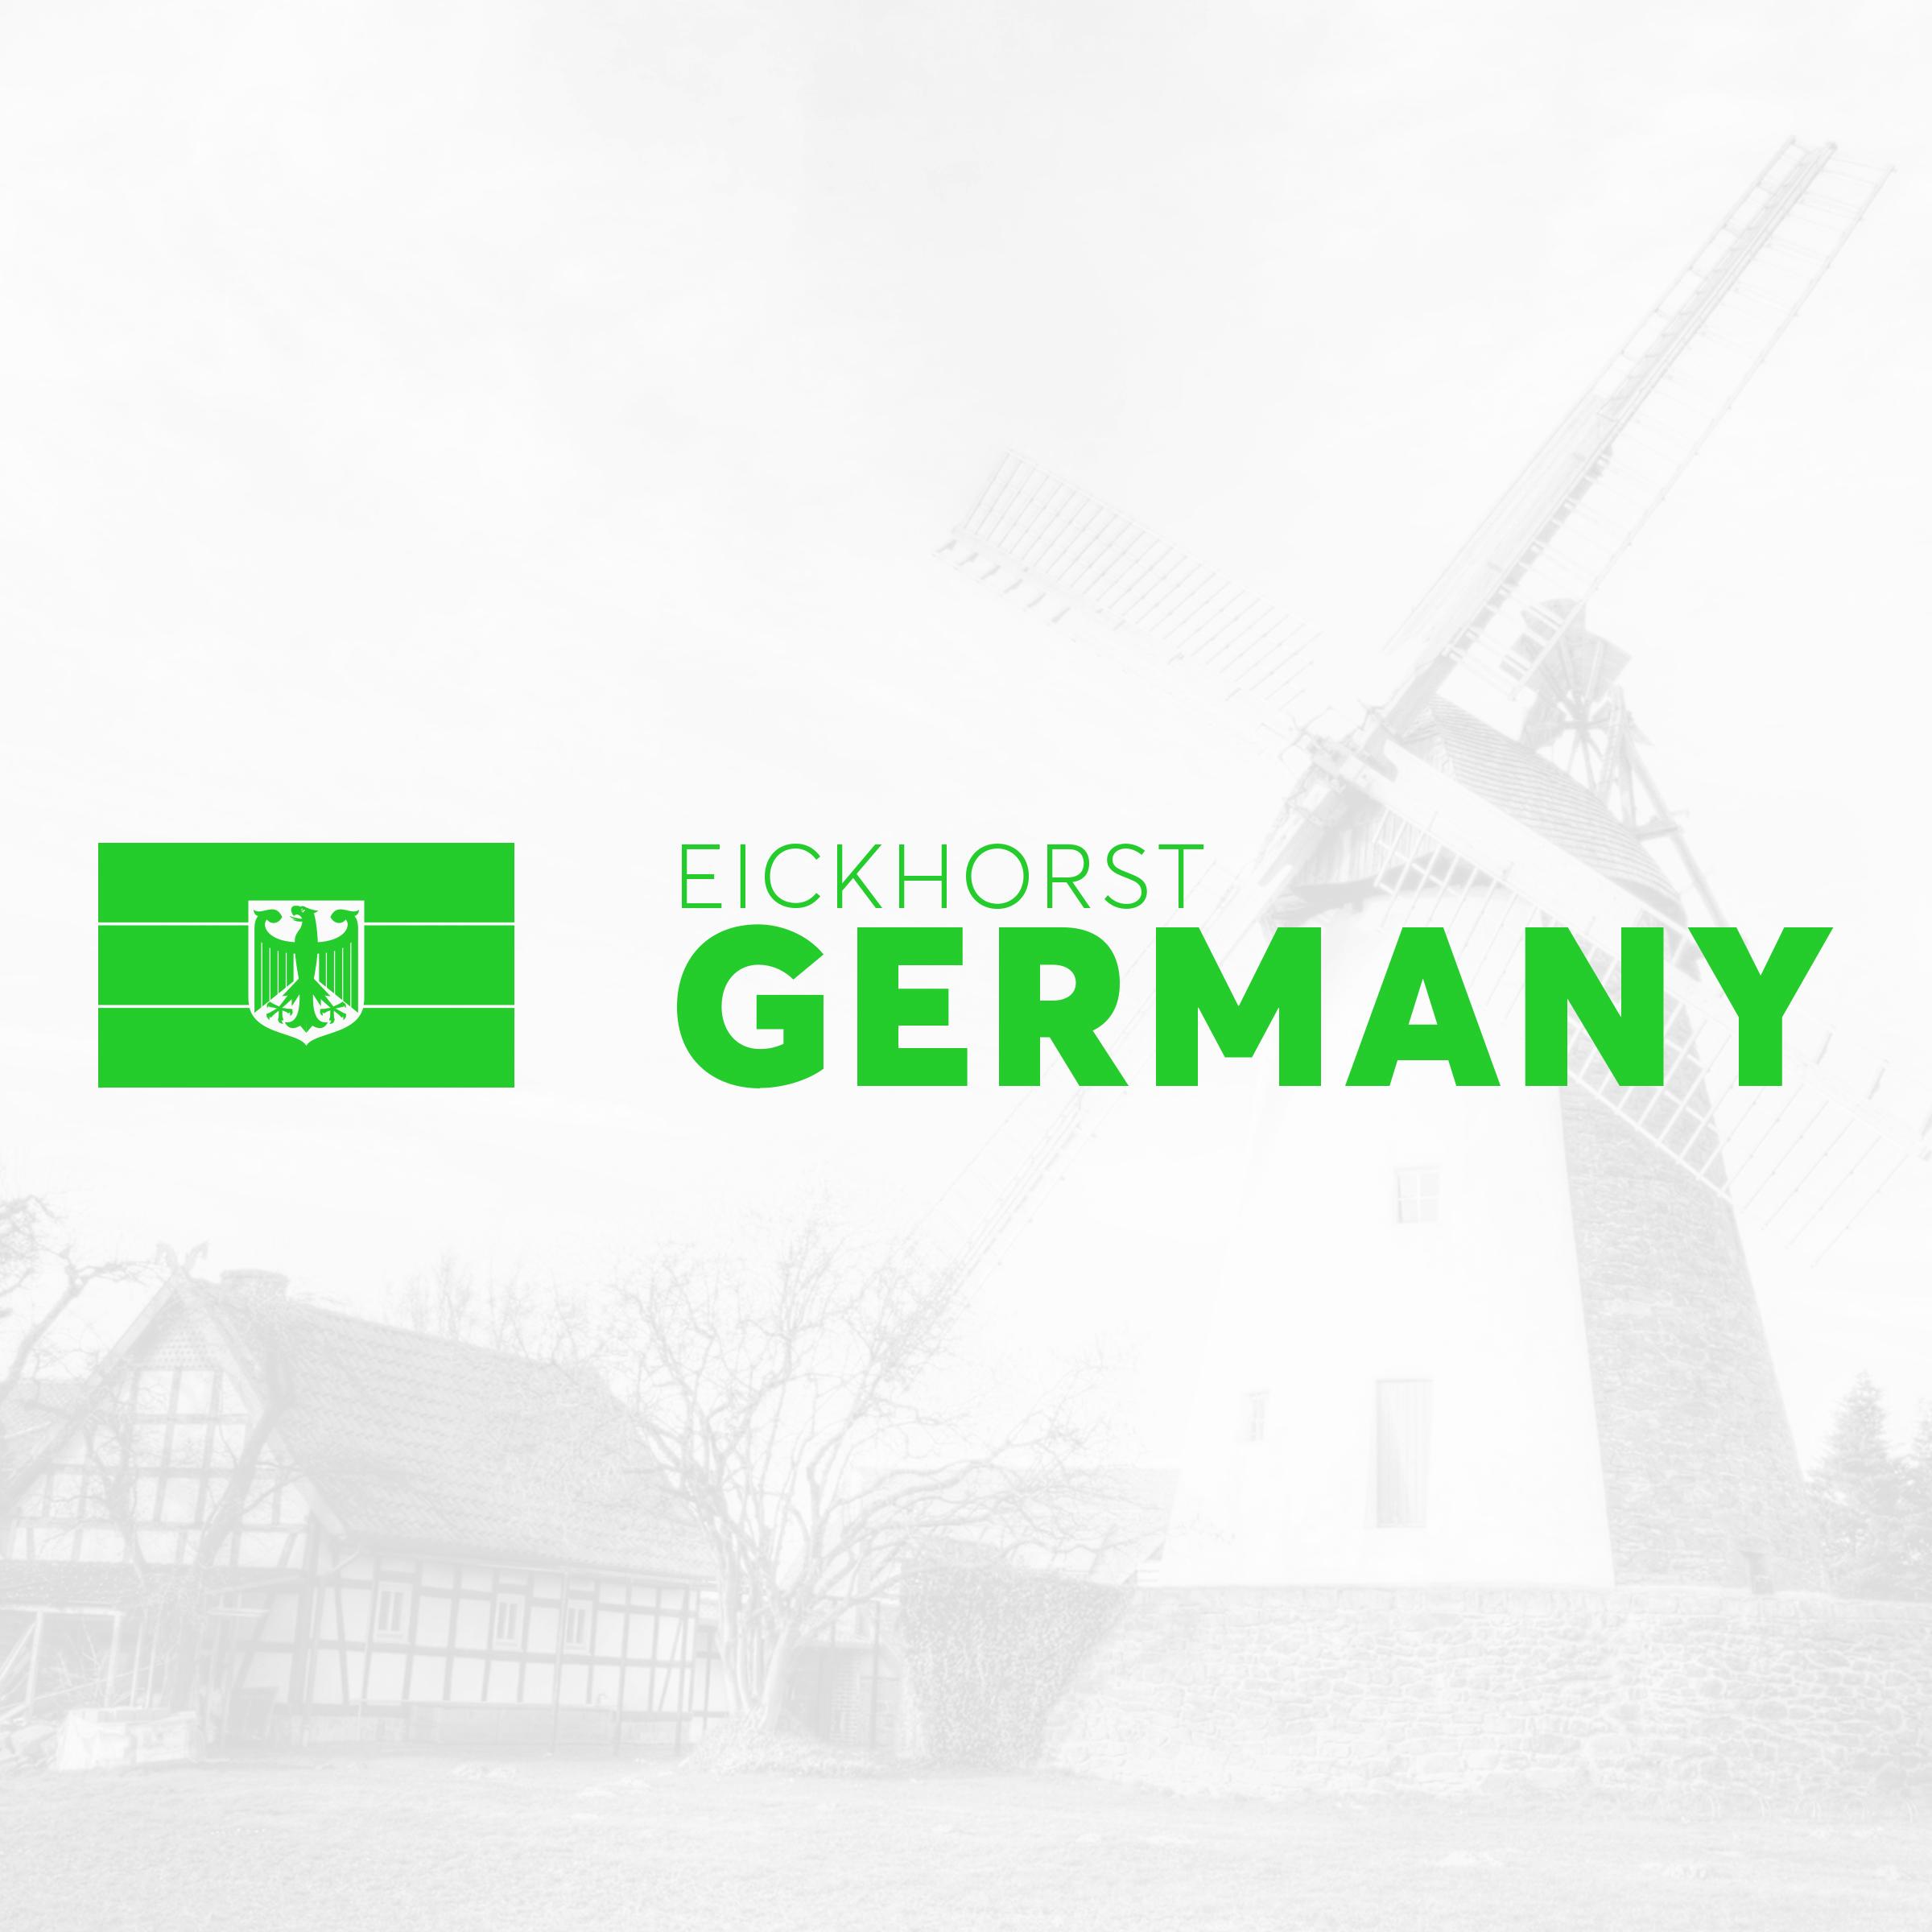 Germany 1080x1080.jpg